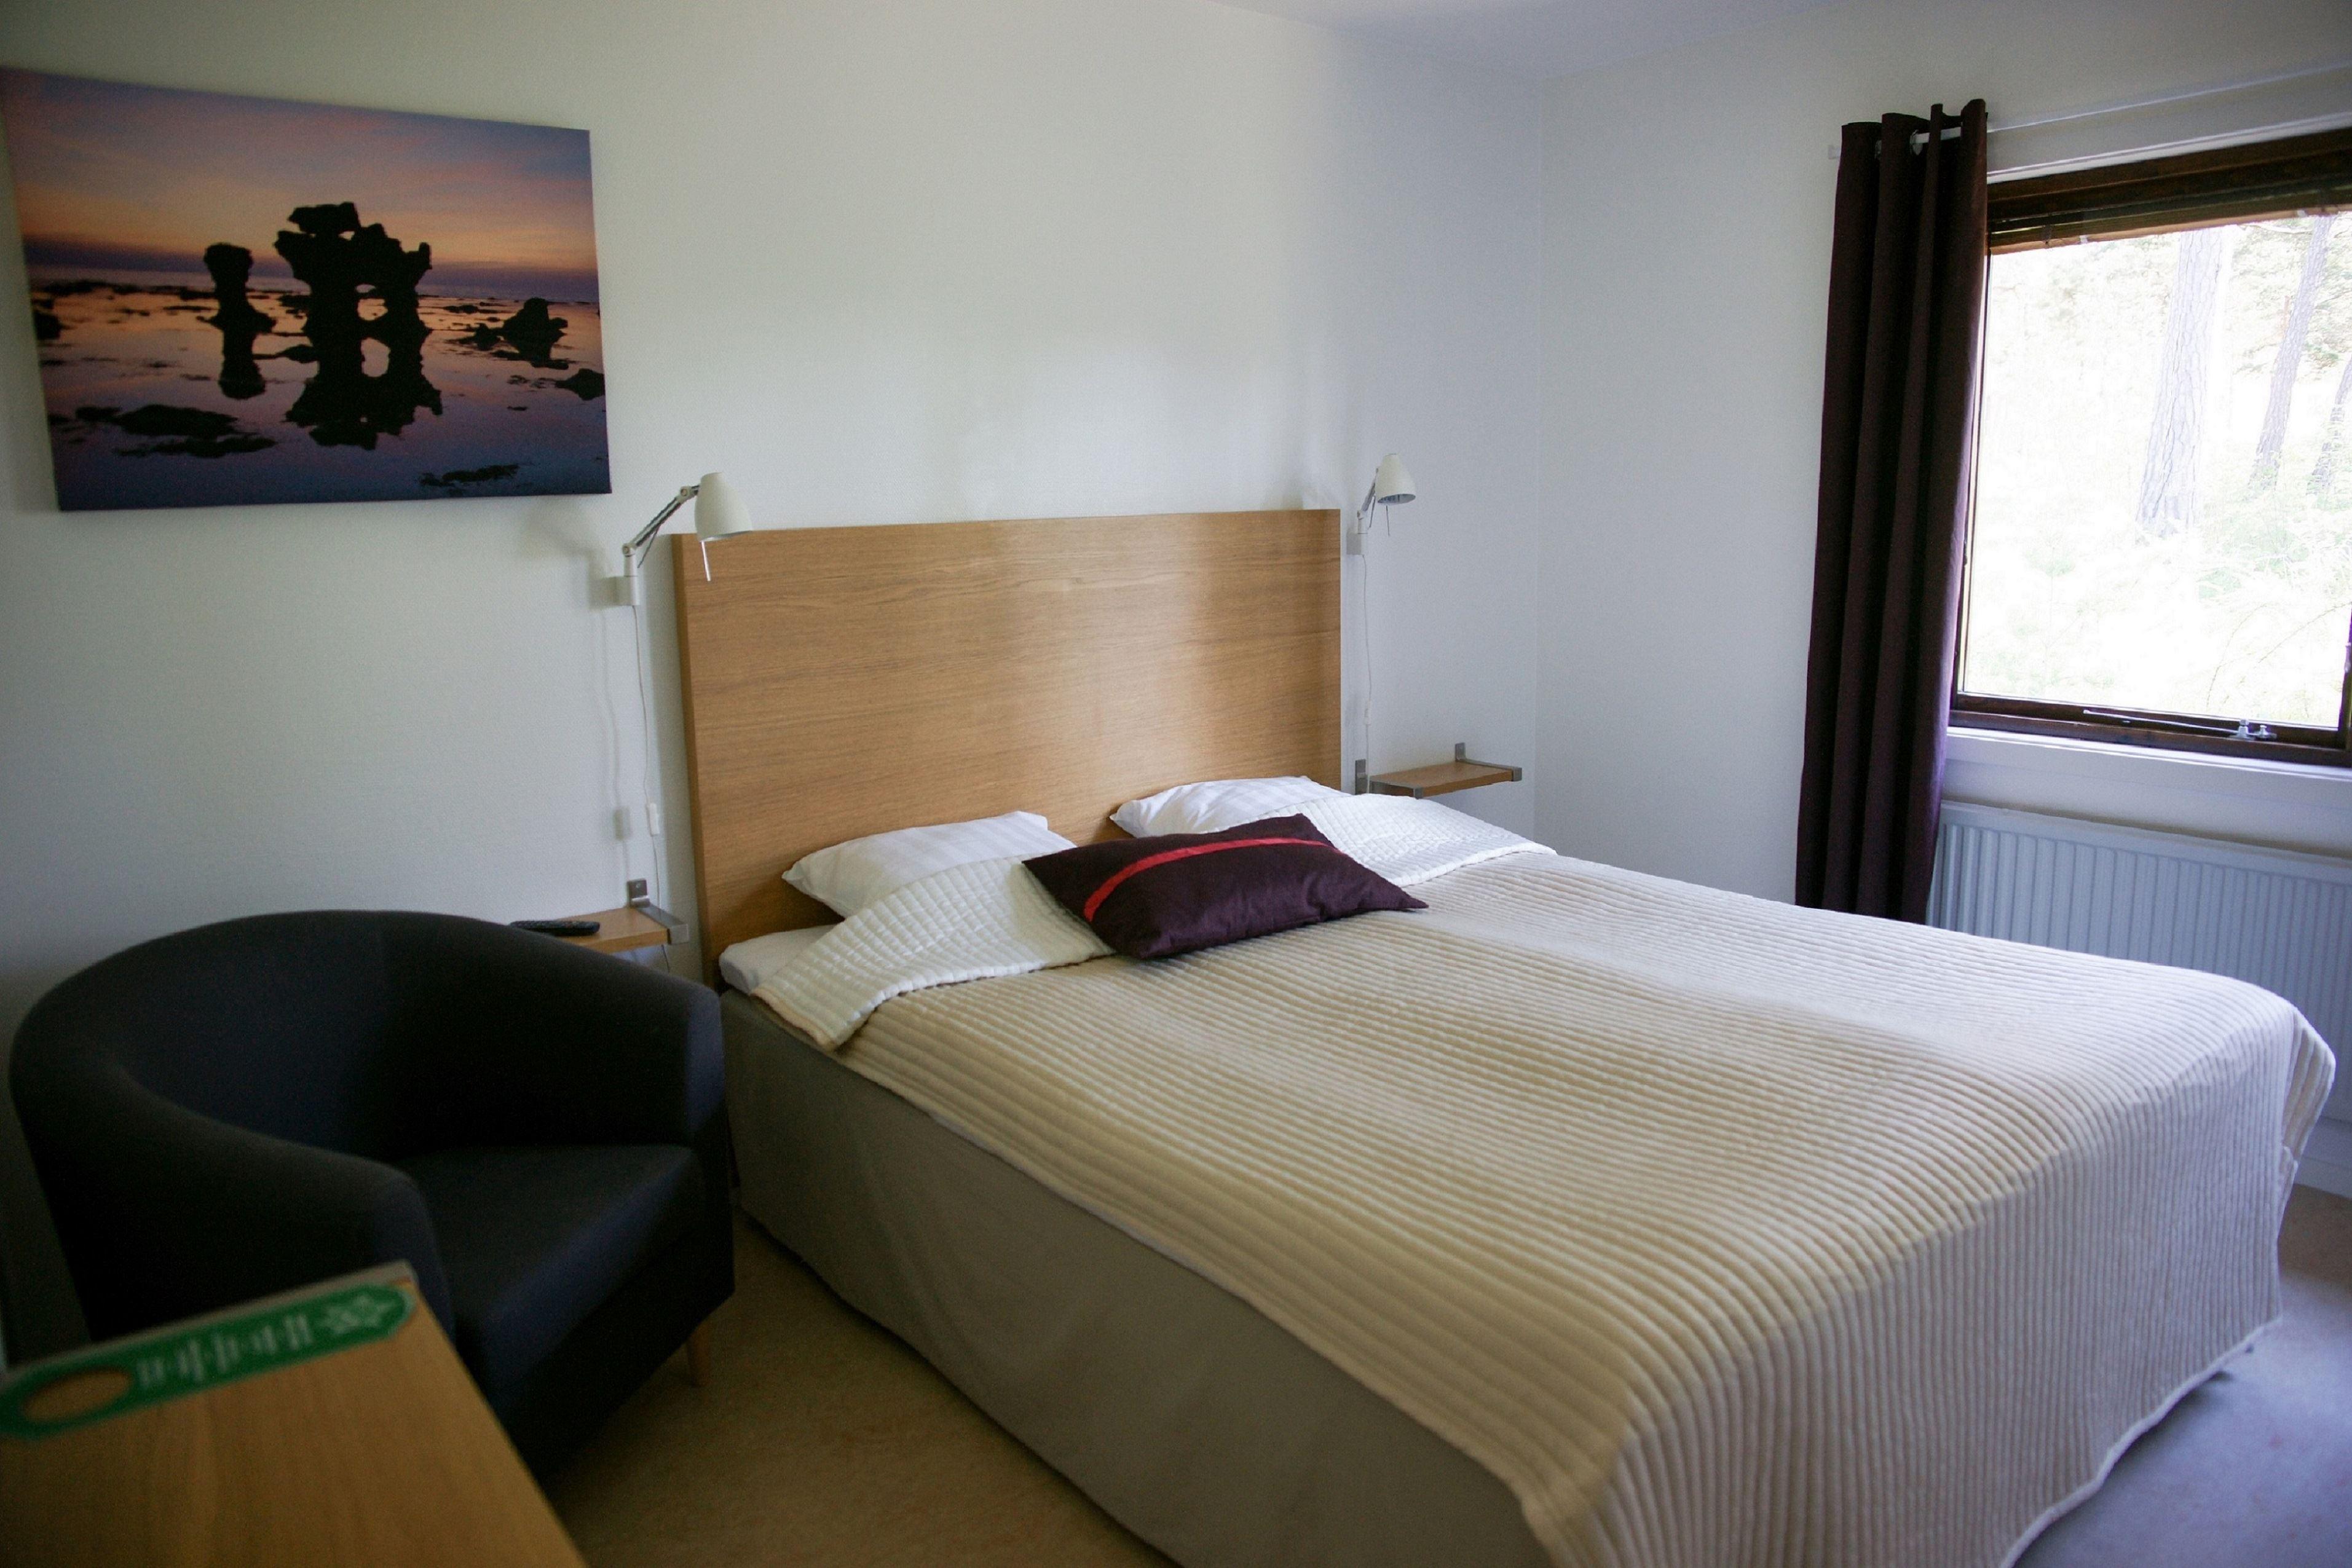 Gotlands IdrottsCenters Hotell